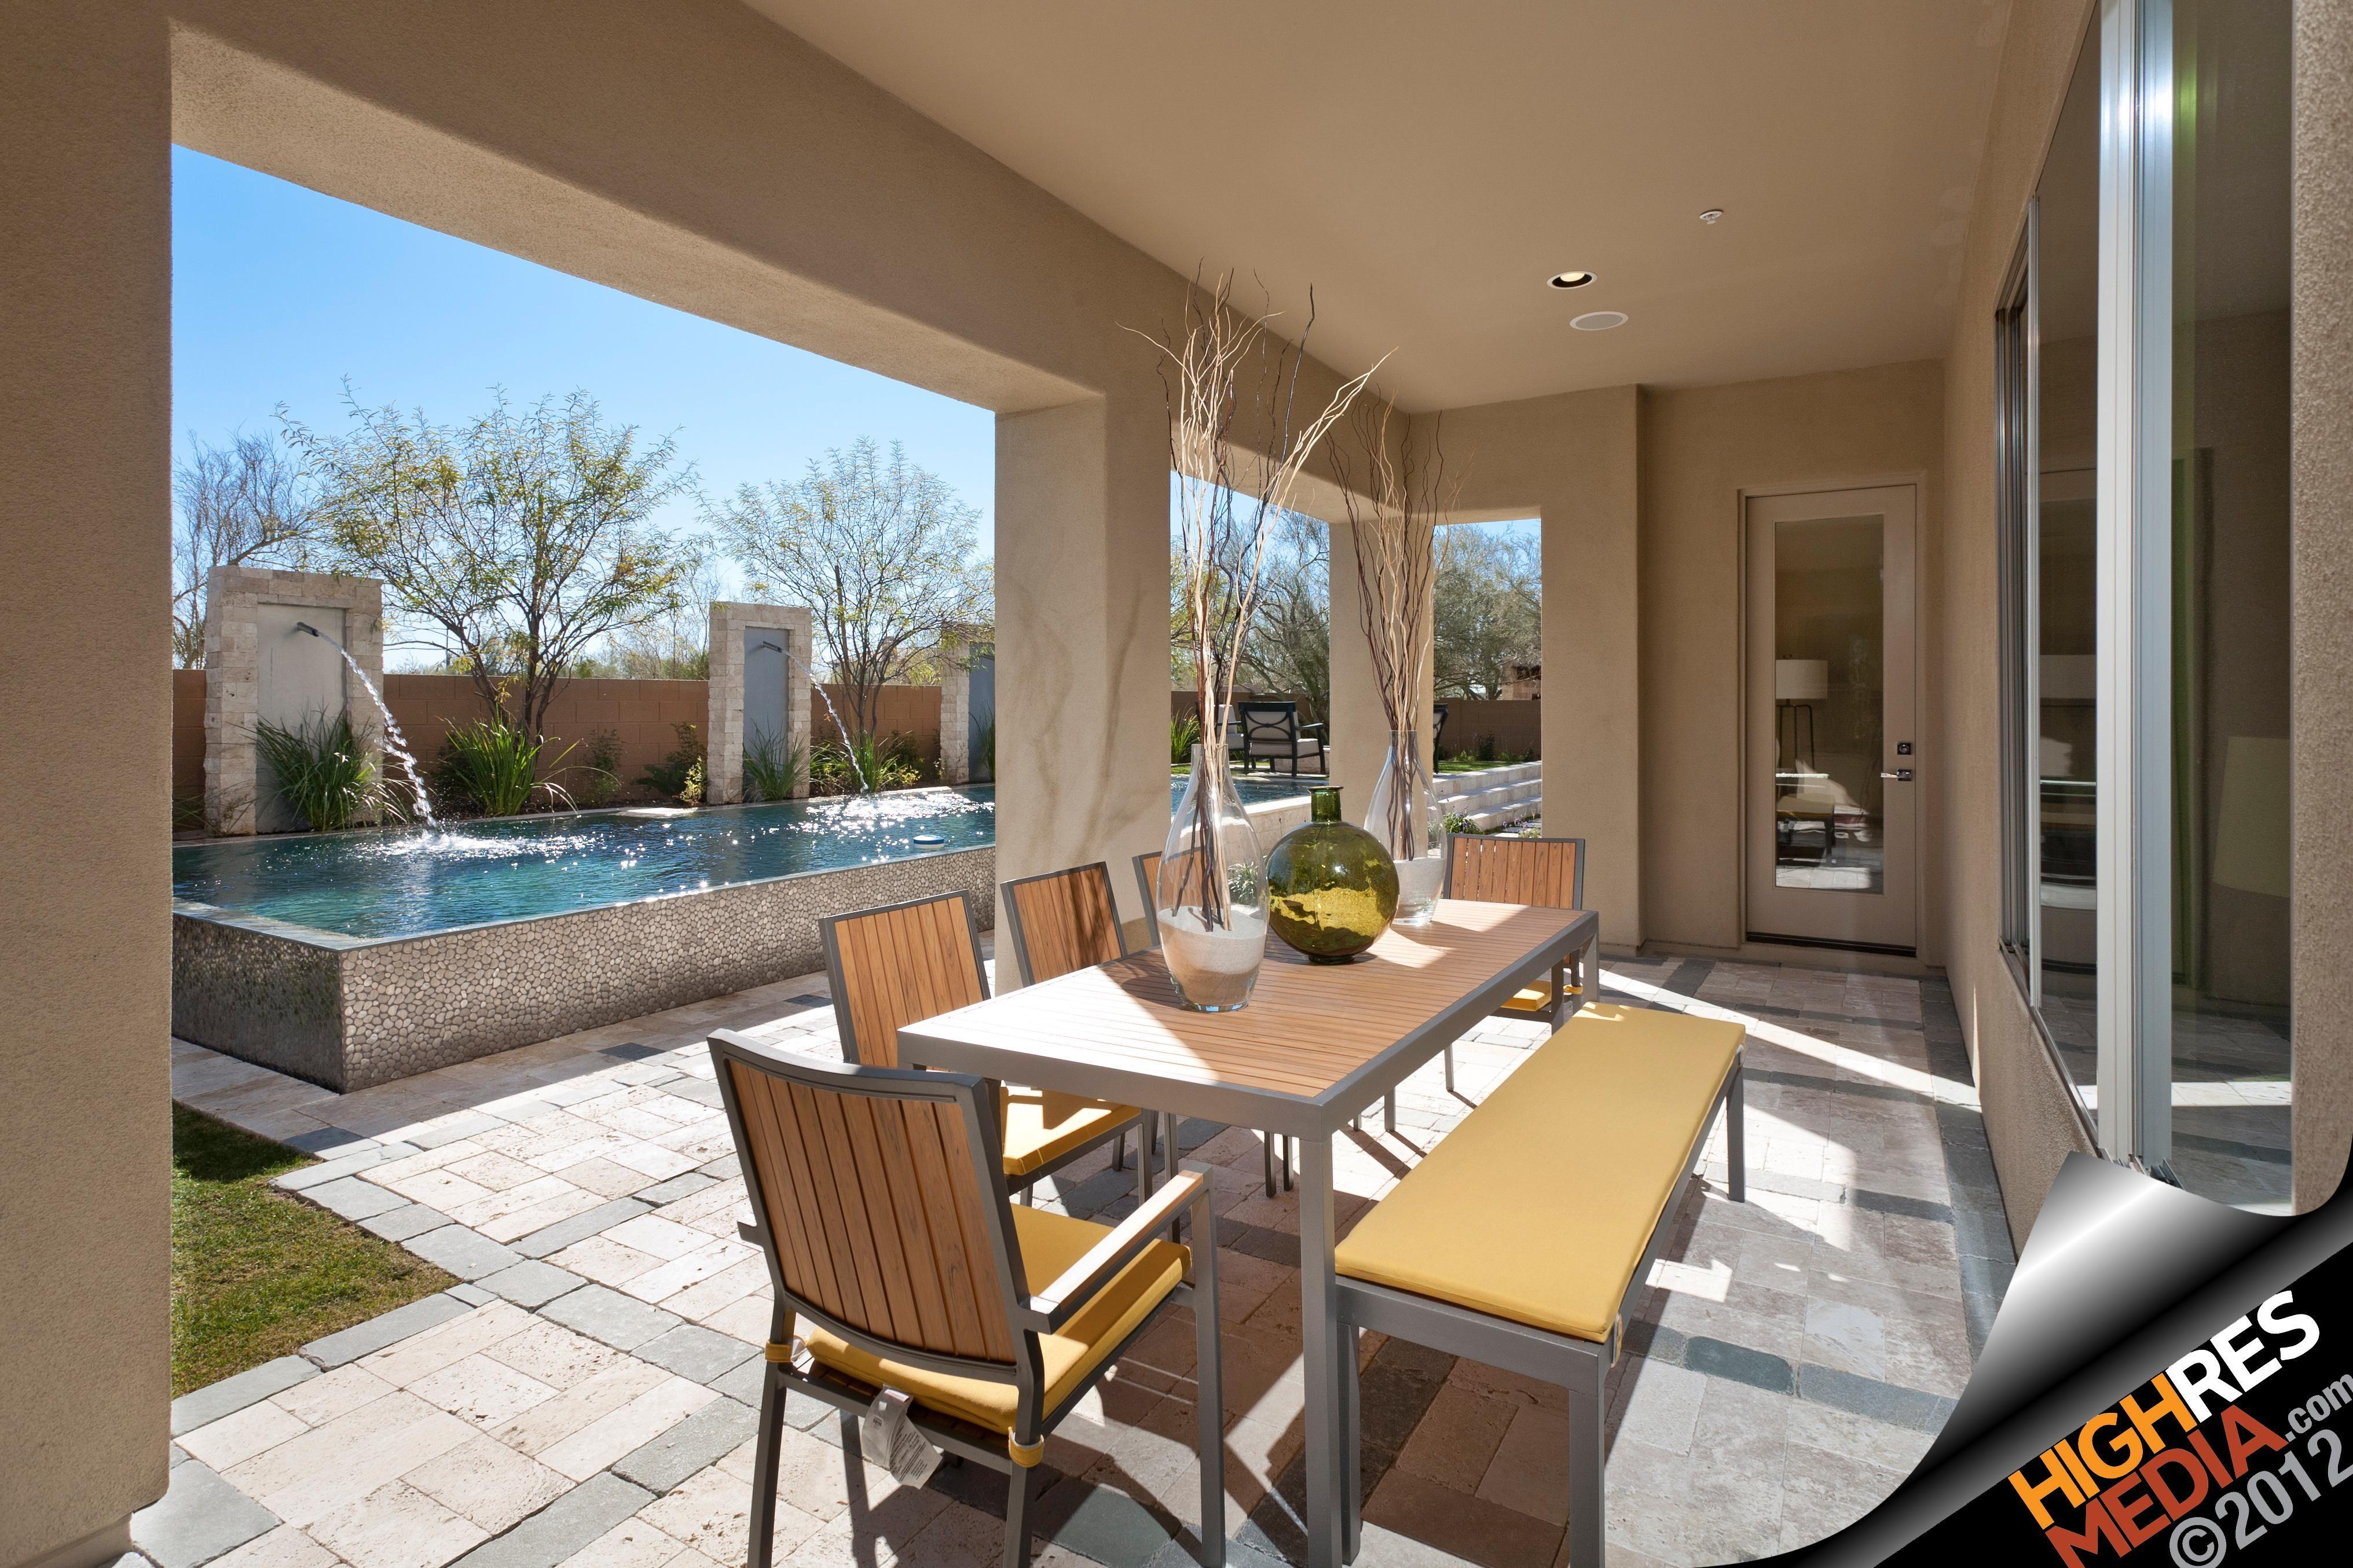 Luxury patio and backyard | HOME!! ⚓️ | Pinterest on Luxury Backyard Patios id=48781